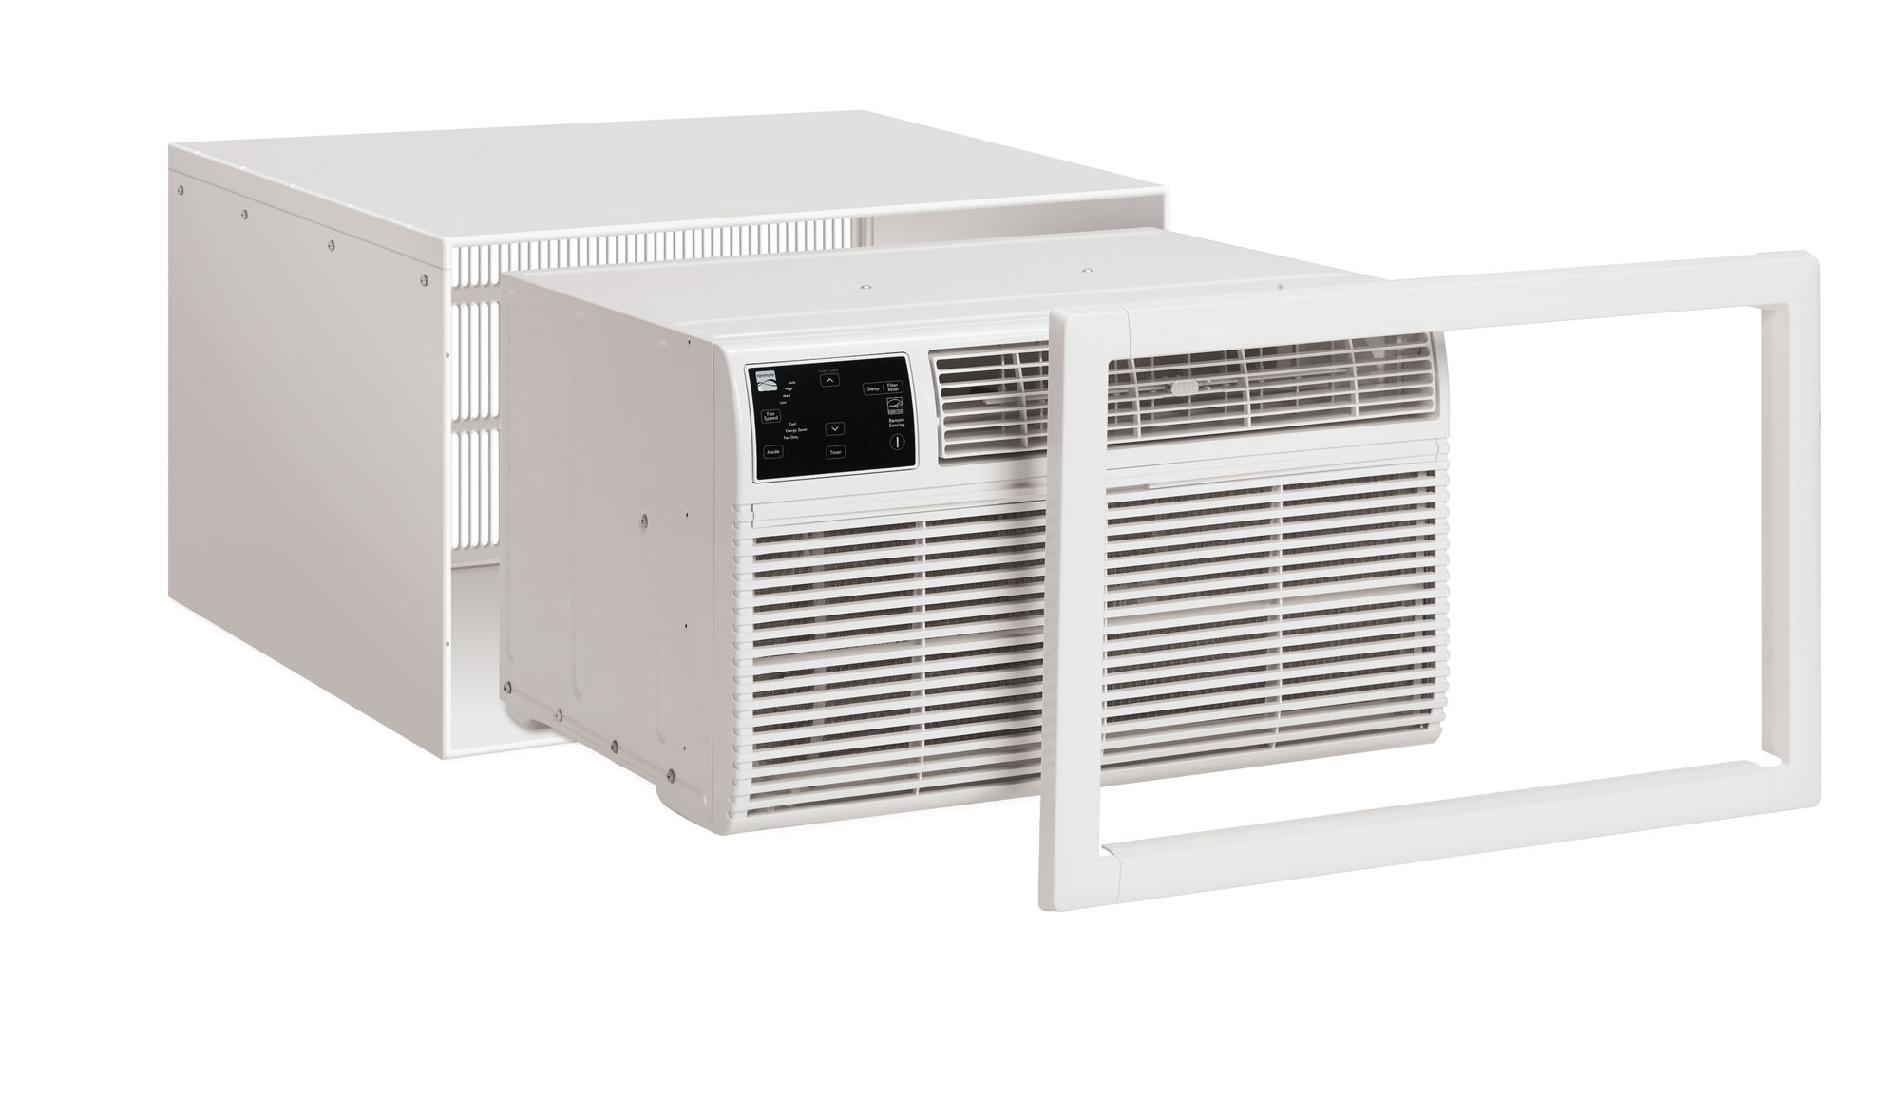 Kenmore 8,000 BTU Through-the-Wall Room Air Conditioner